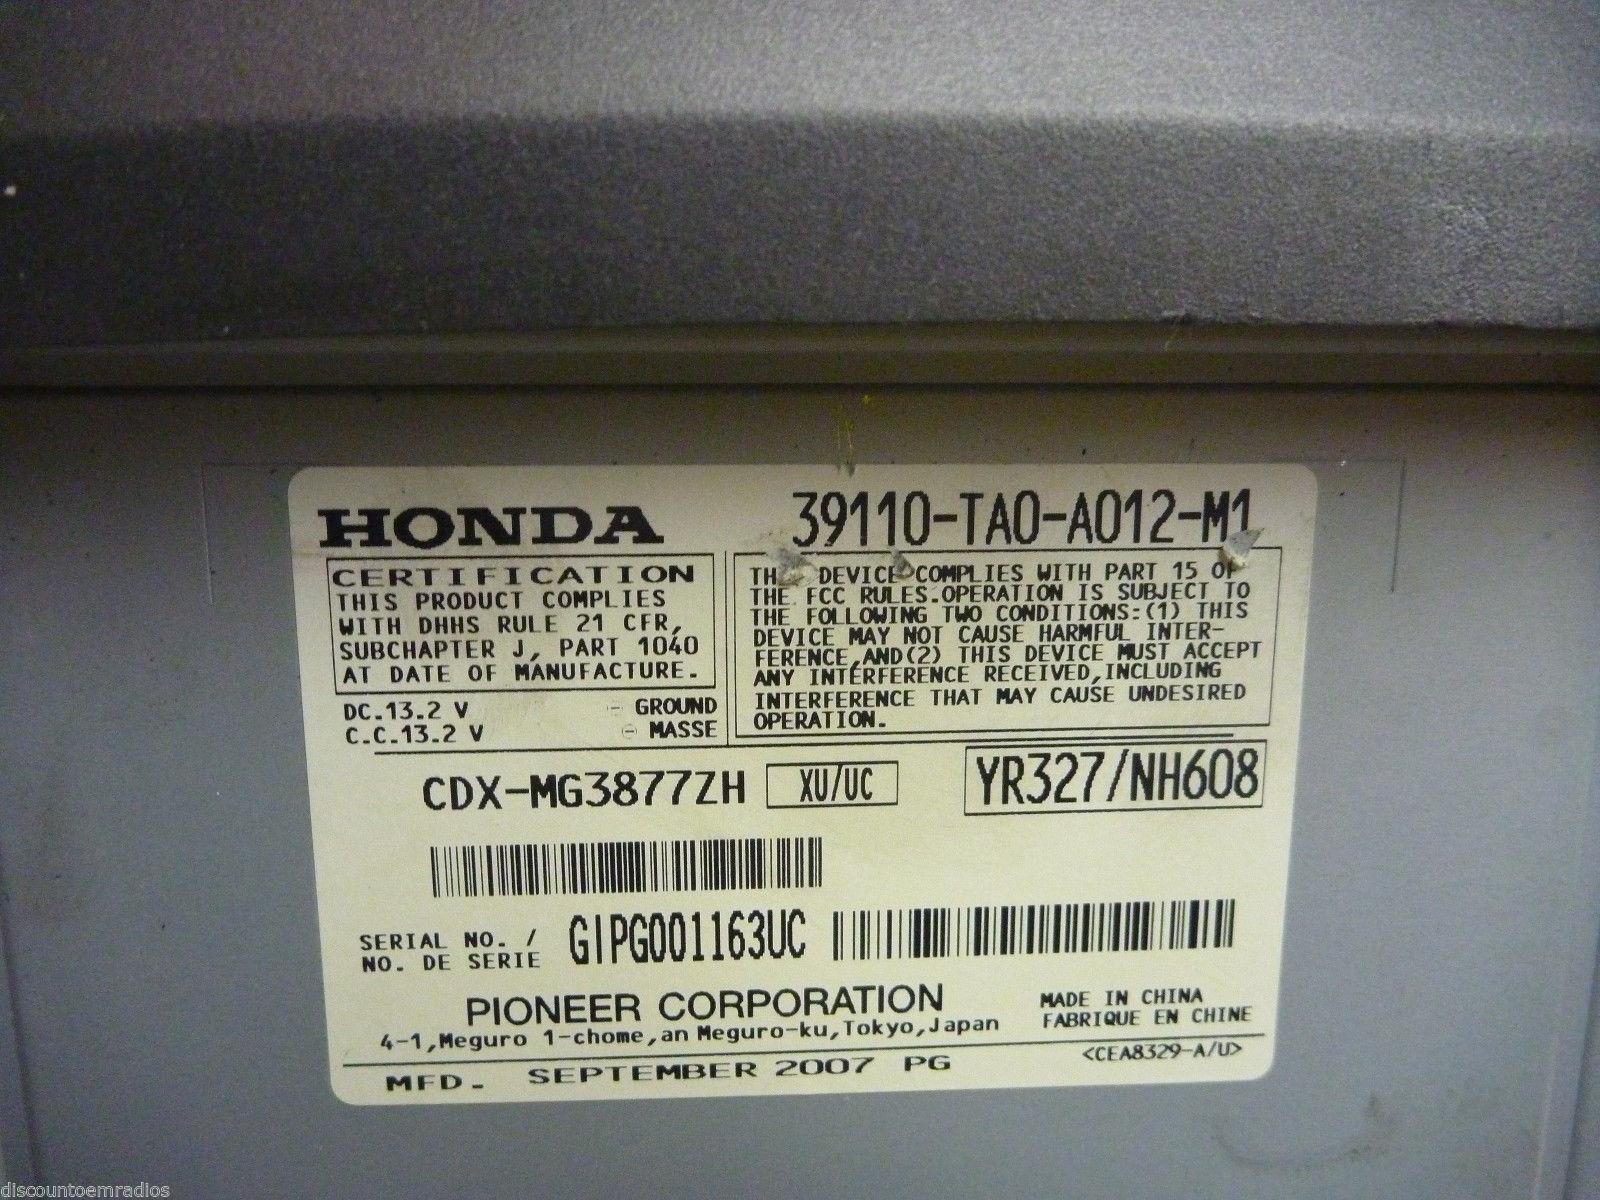 08 09 10 11 12 Honda Accord Premium Remote 6 Cd Player 39110-TA0-A012  C53483